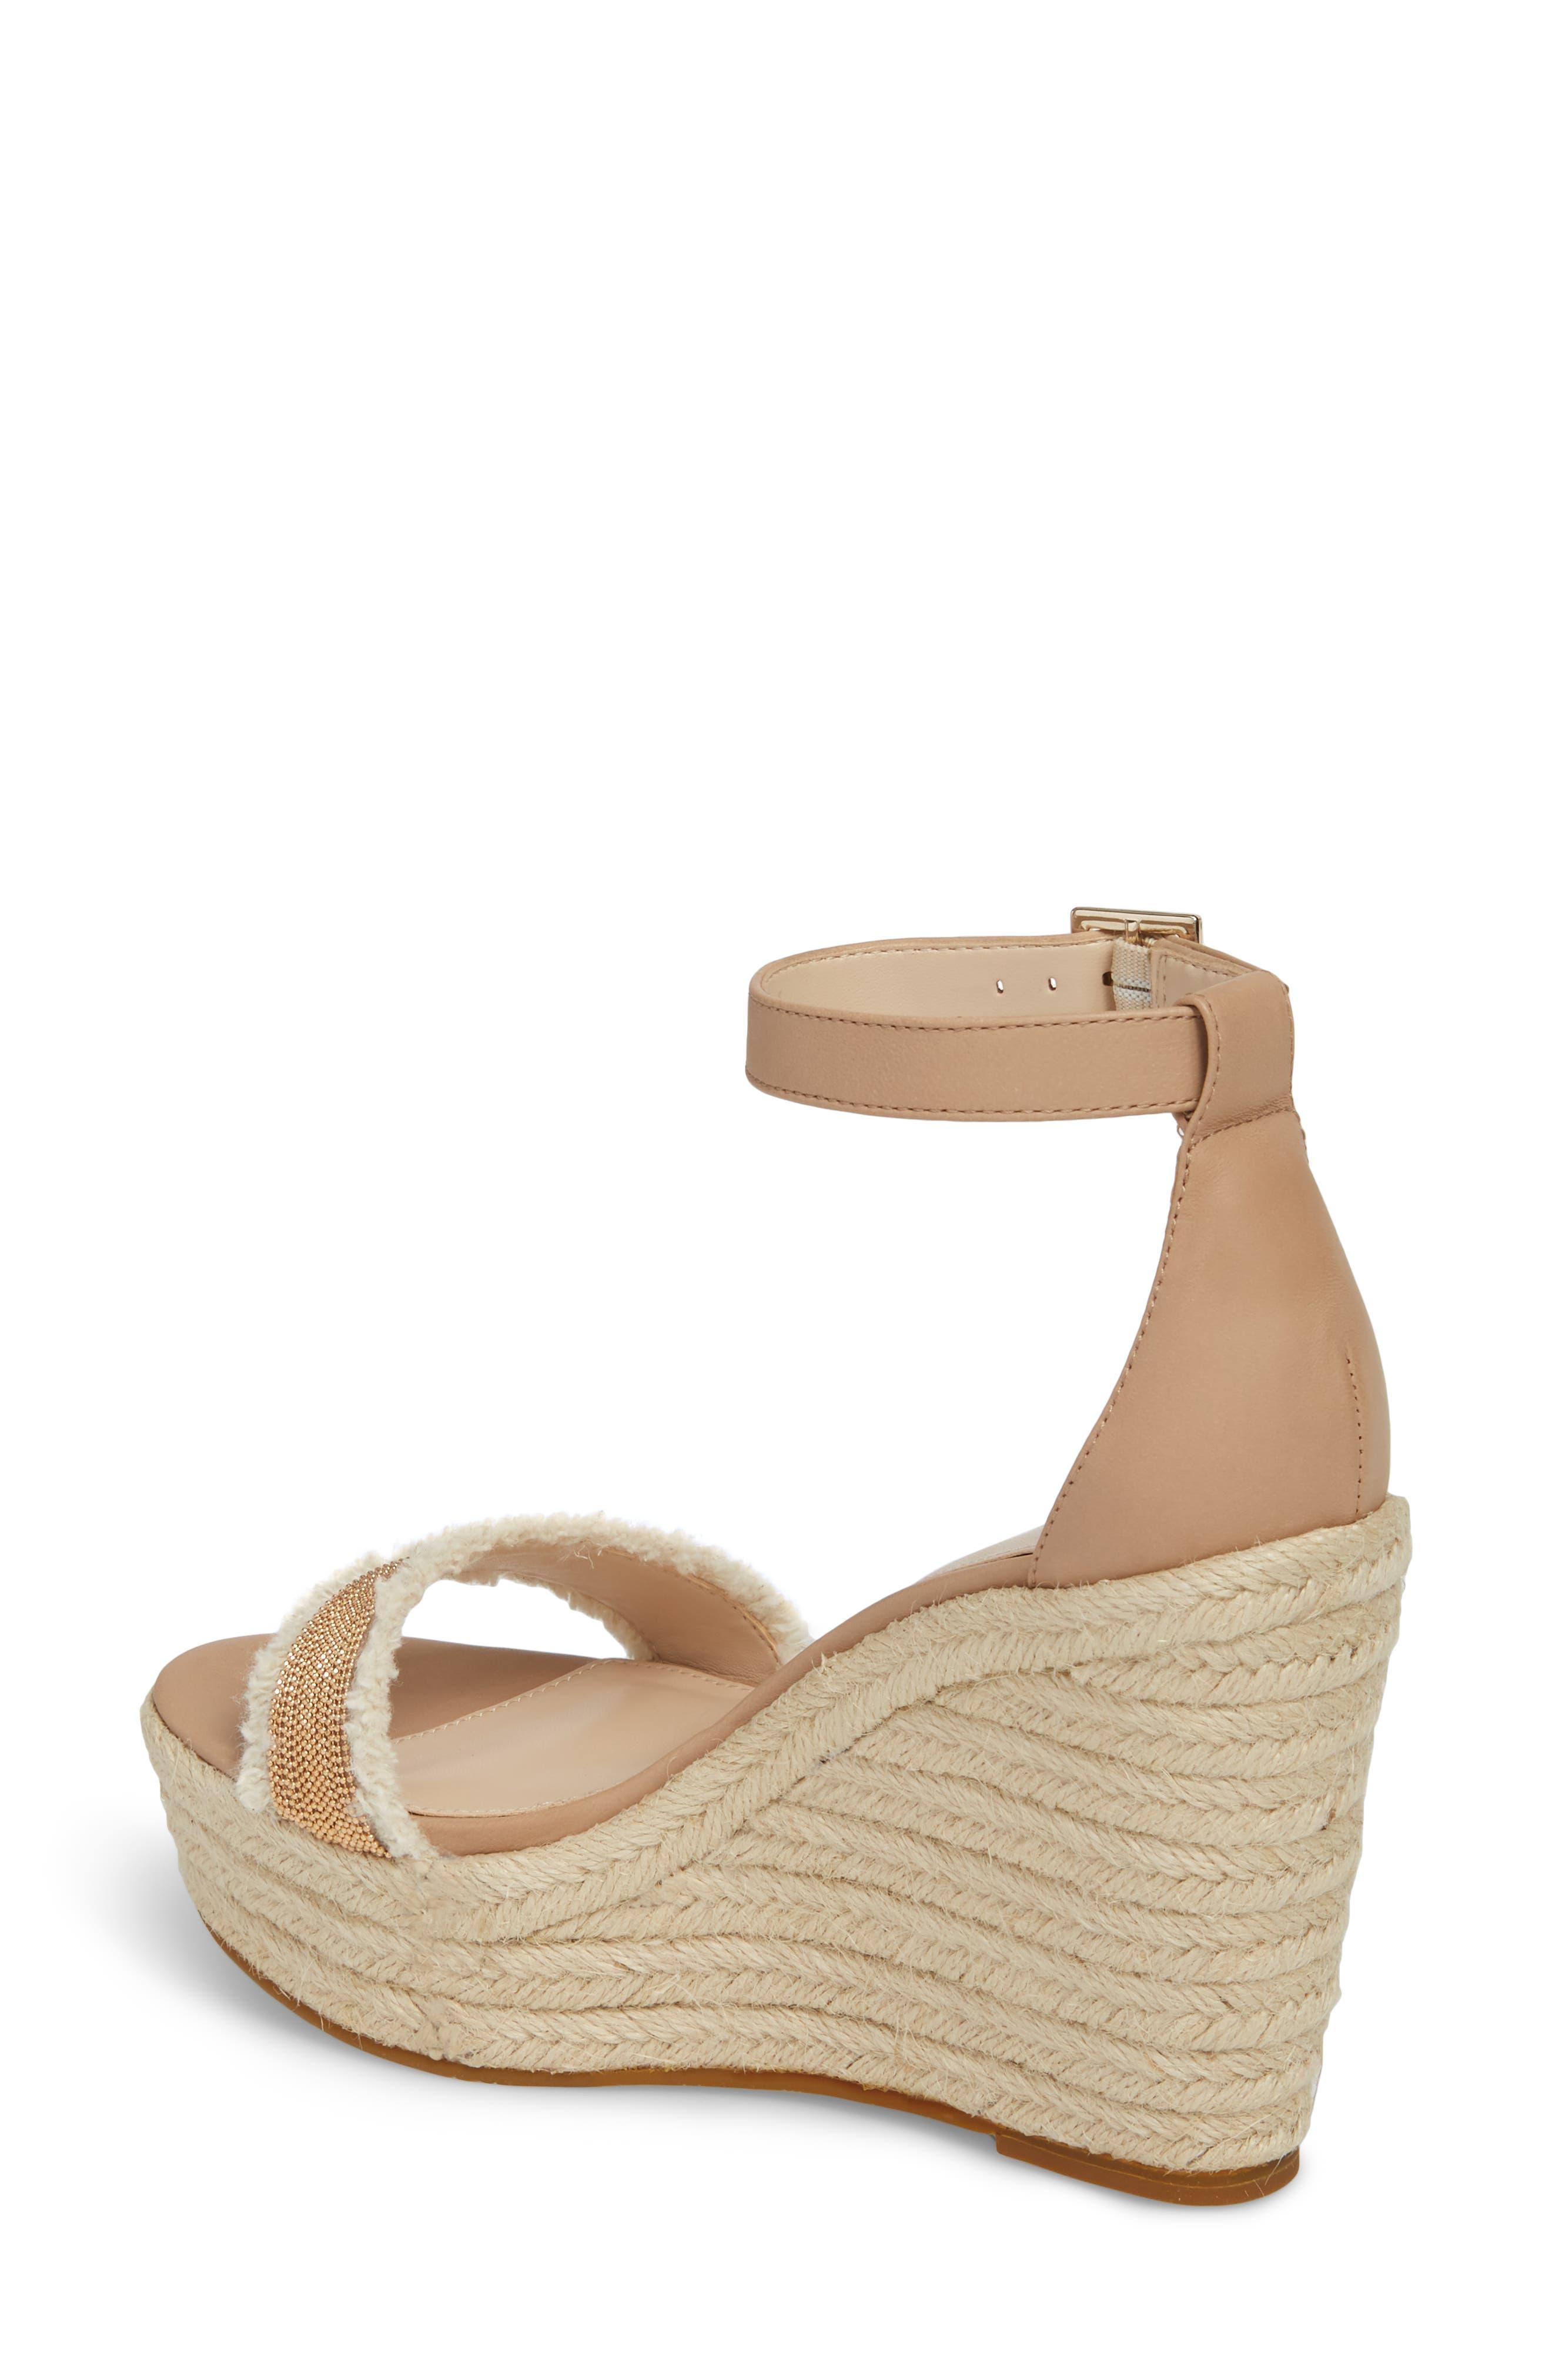 Radley Espadrille Wedge Sandal,                             Alternate thumbnail 2, color,                             Sand Leather